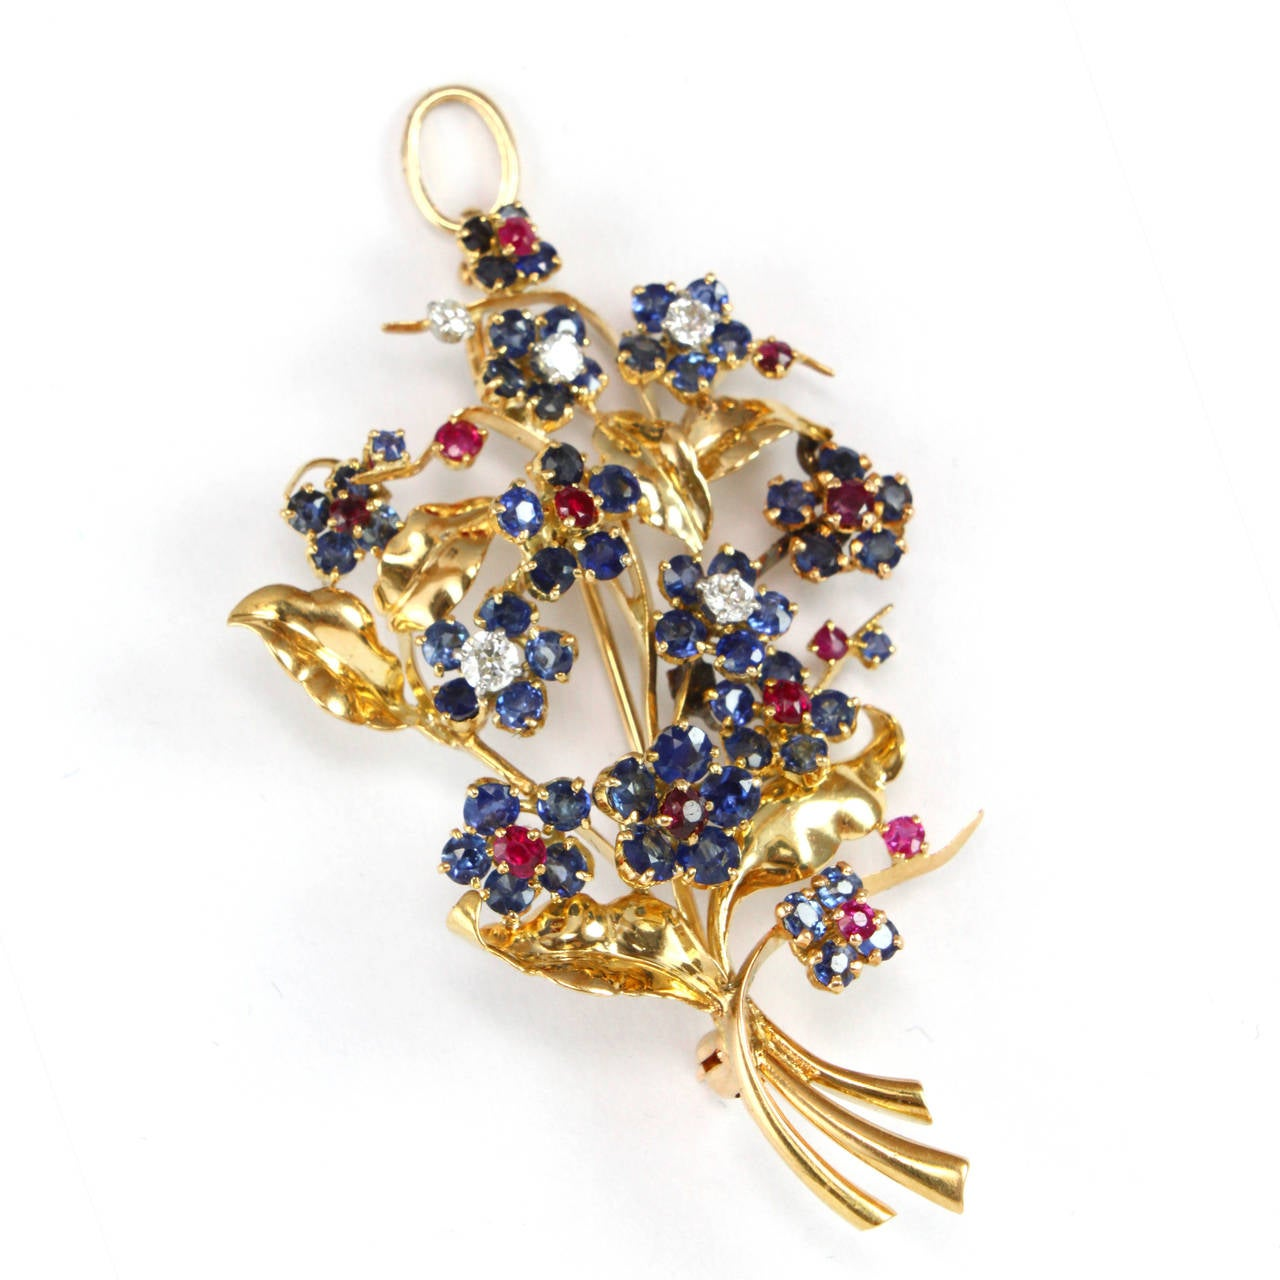 Women's 1948 Mauboussin Ruby Sapphire Diamond Flower Brooch or Pendant For Sale